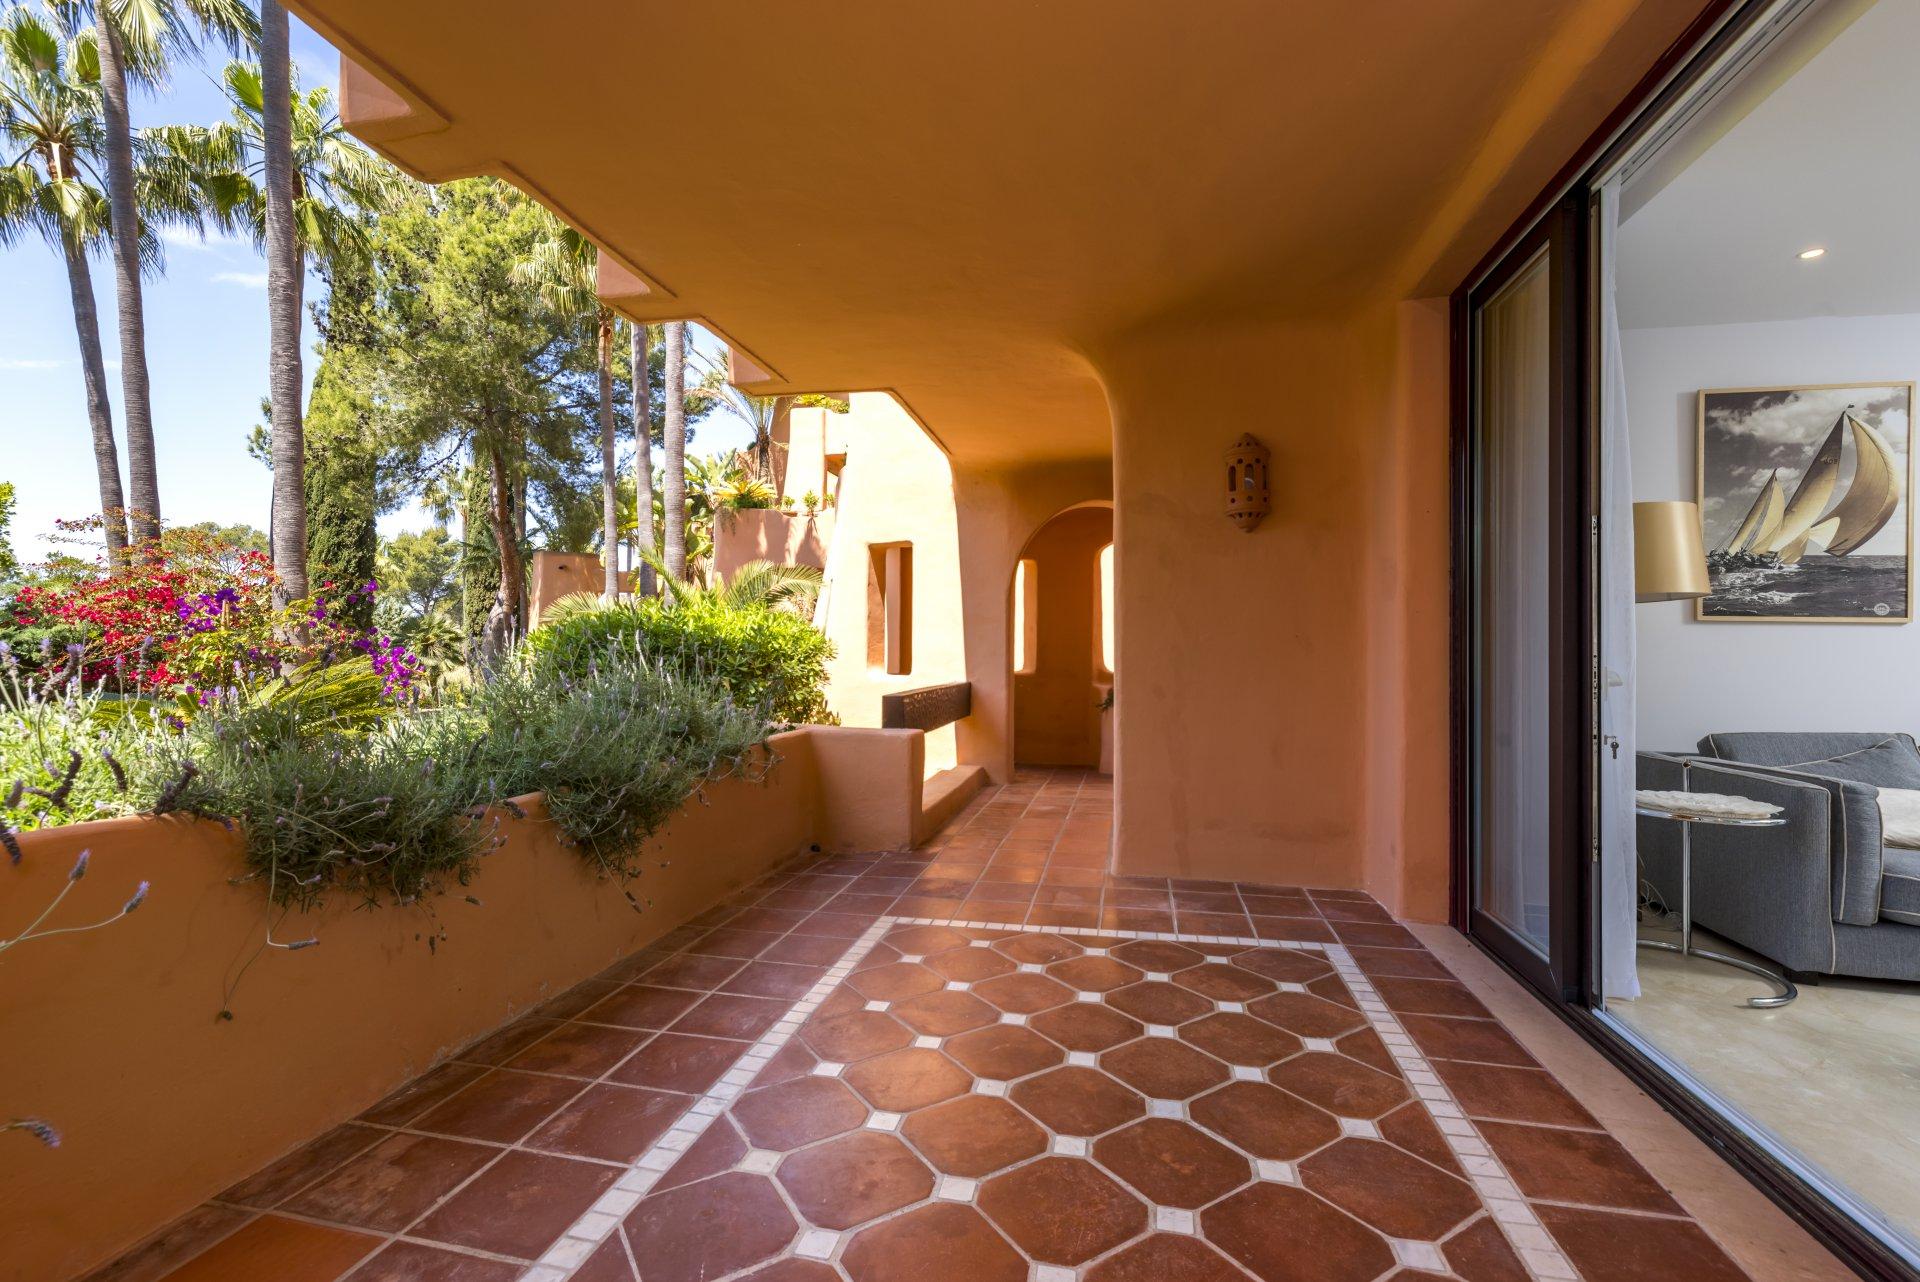 Ad Sale Apartment Santa Ponsa (07180) ref:V0300SP